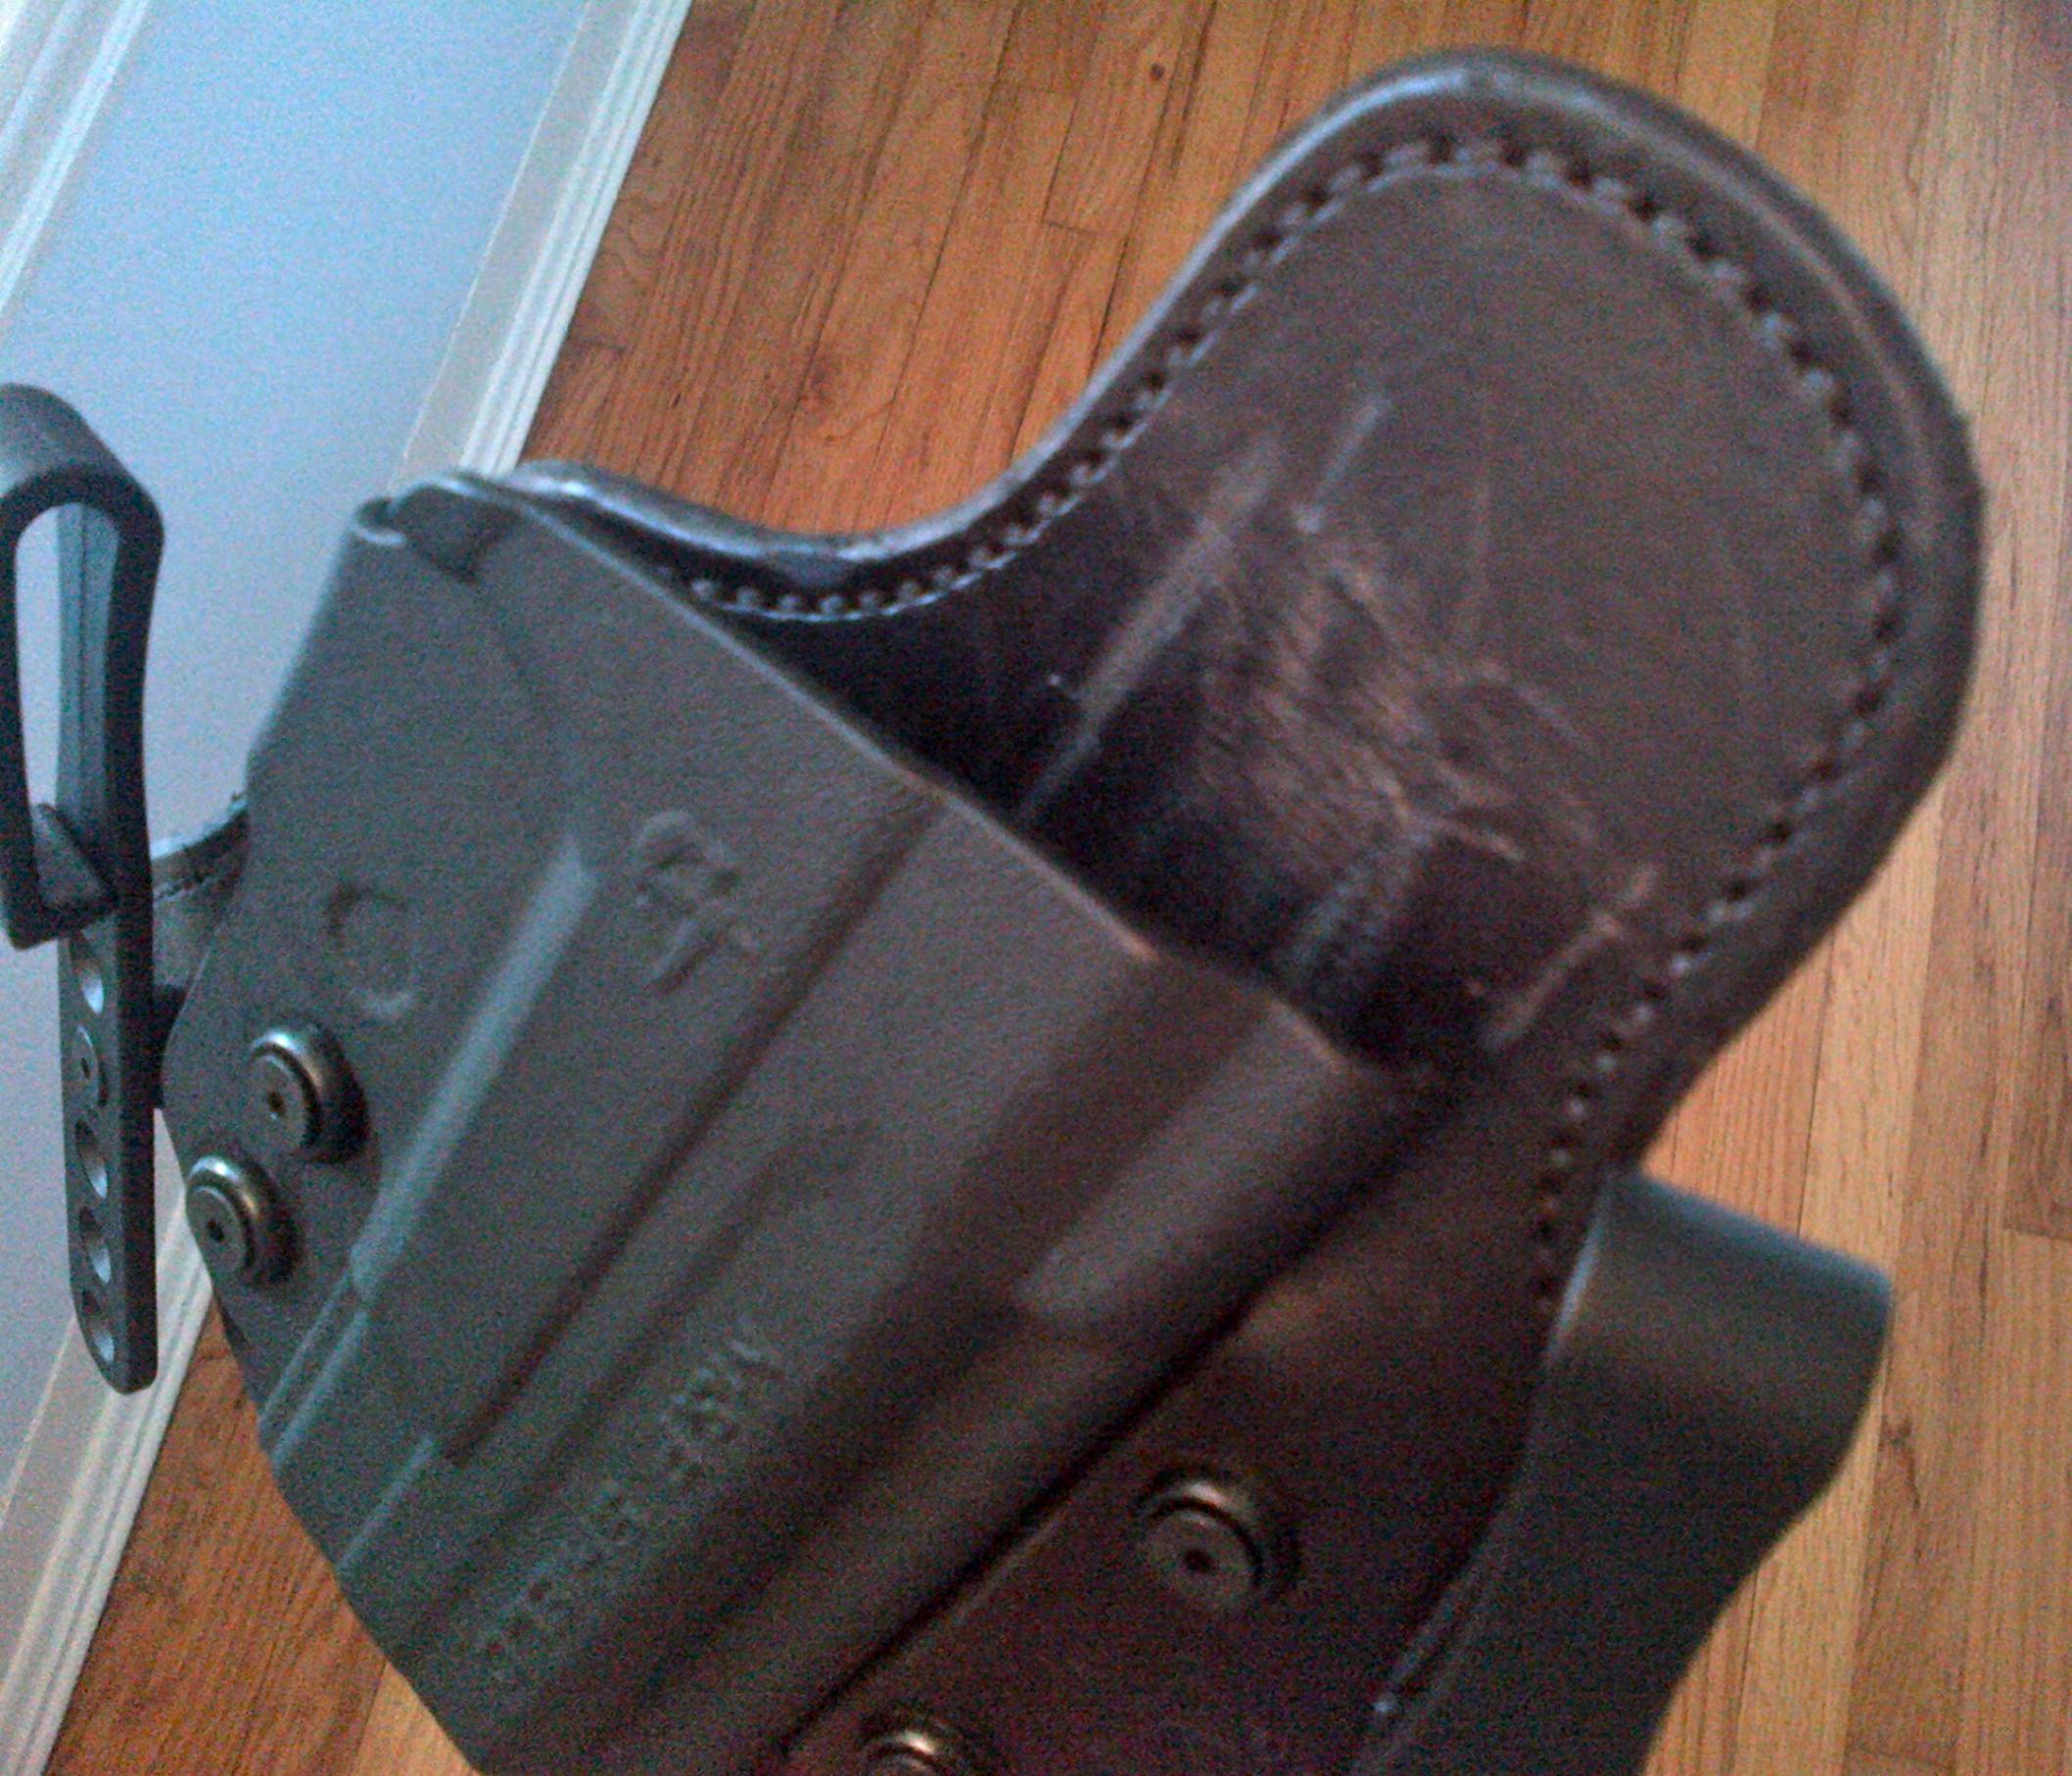 WTS: Like New Comp-Tac Minotaur MTAC for M&P Shield (TX)-img-20120730-00385.jpg